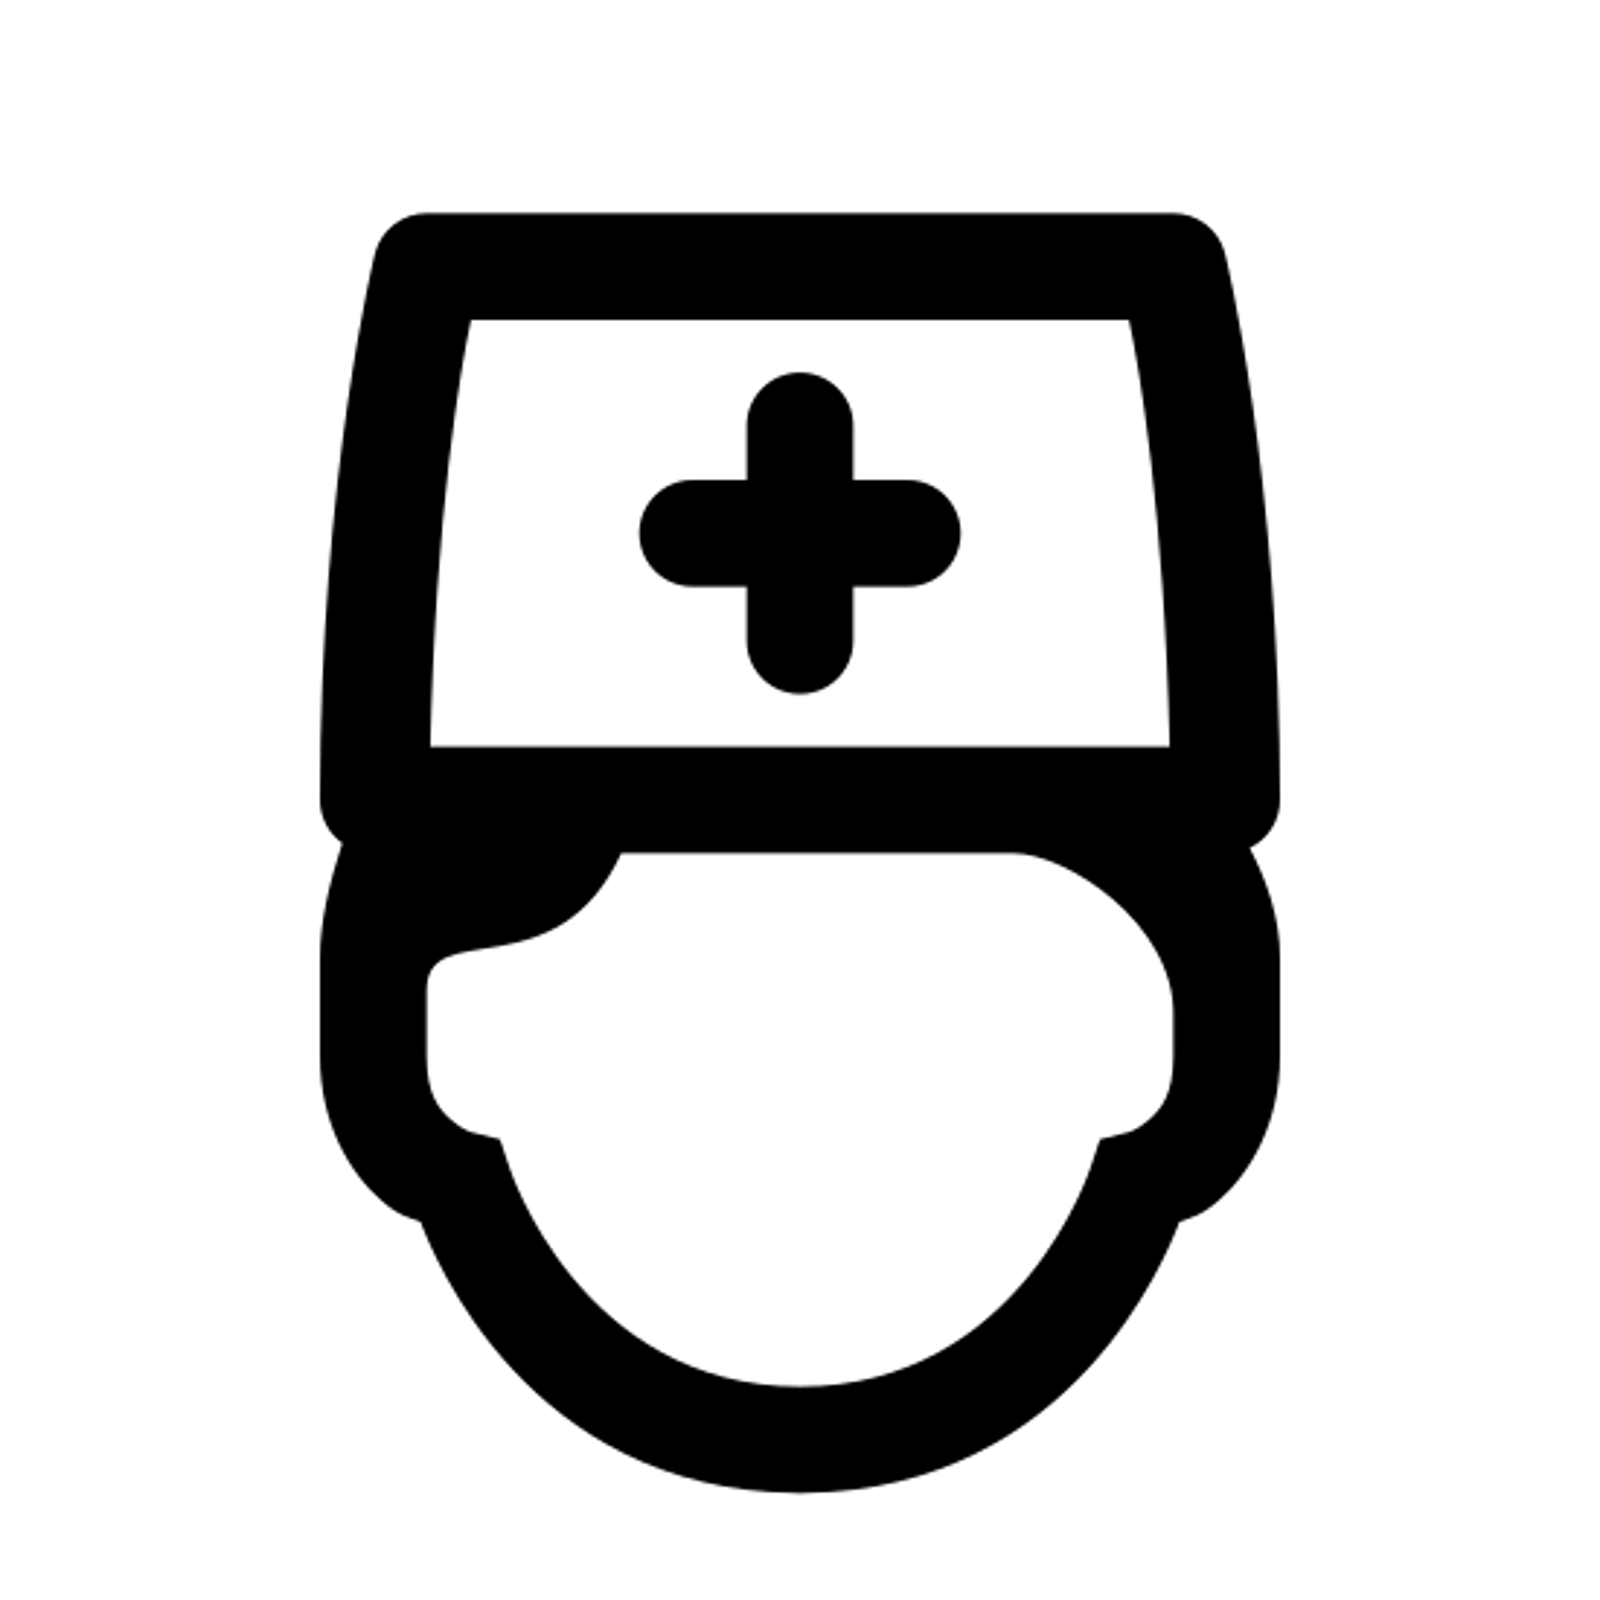 Nurse Male icon